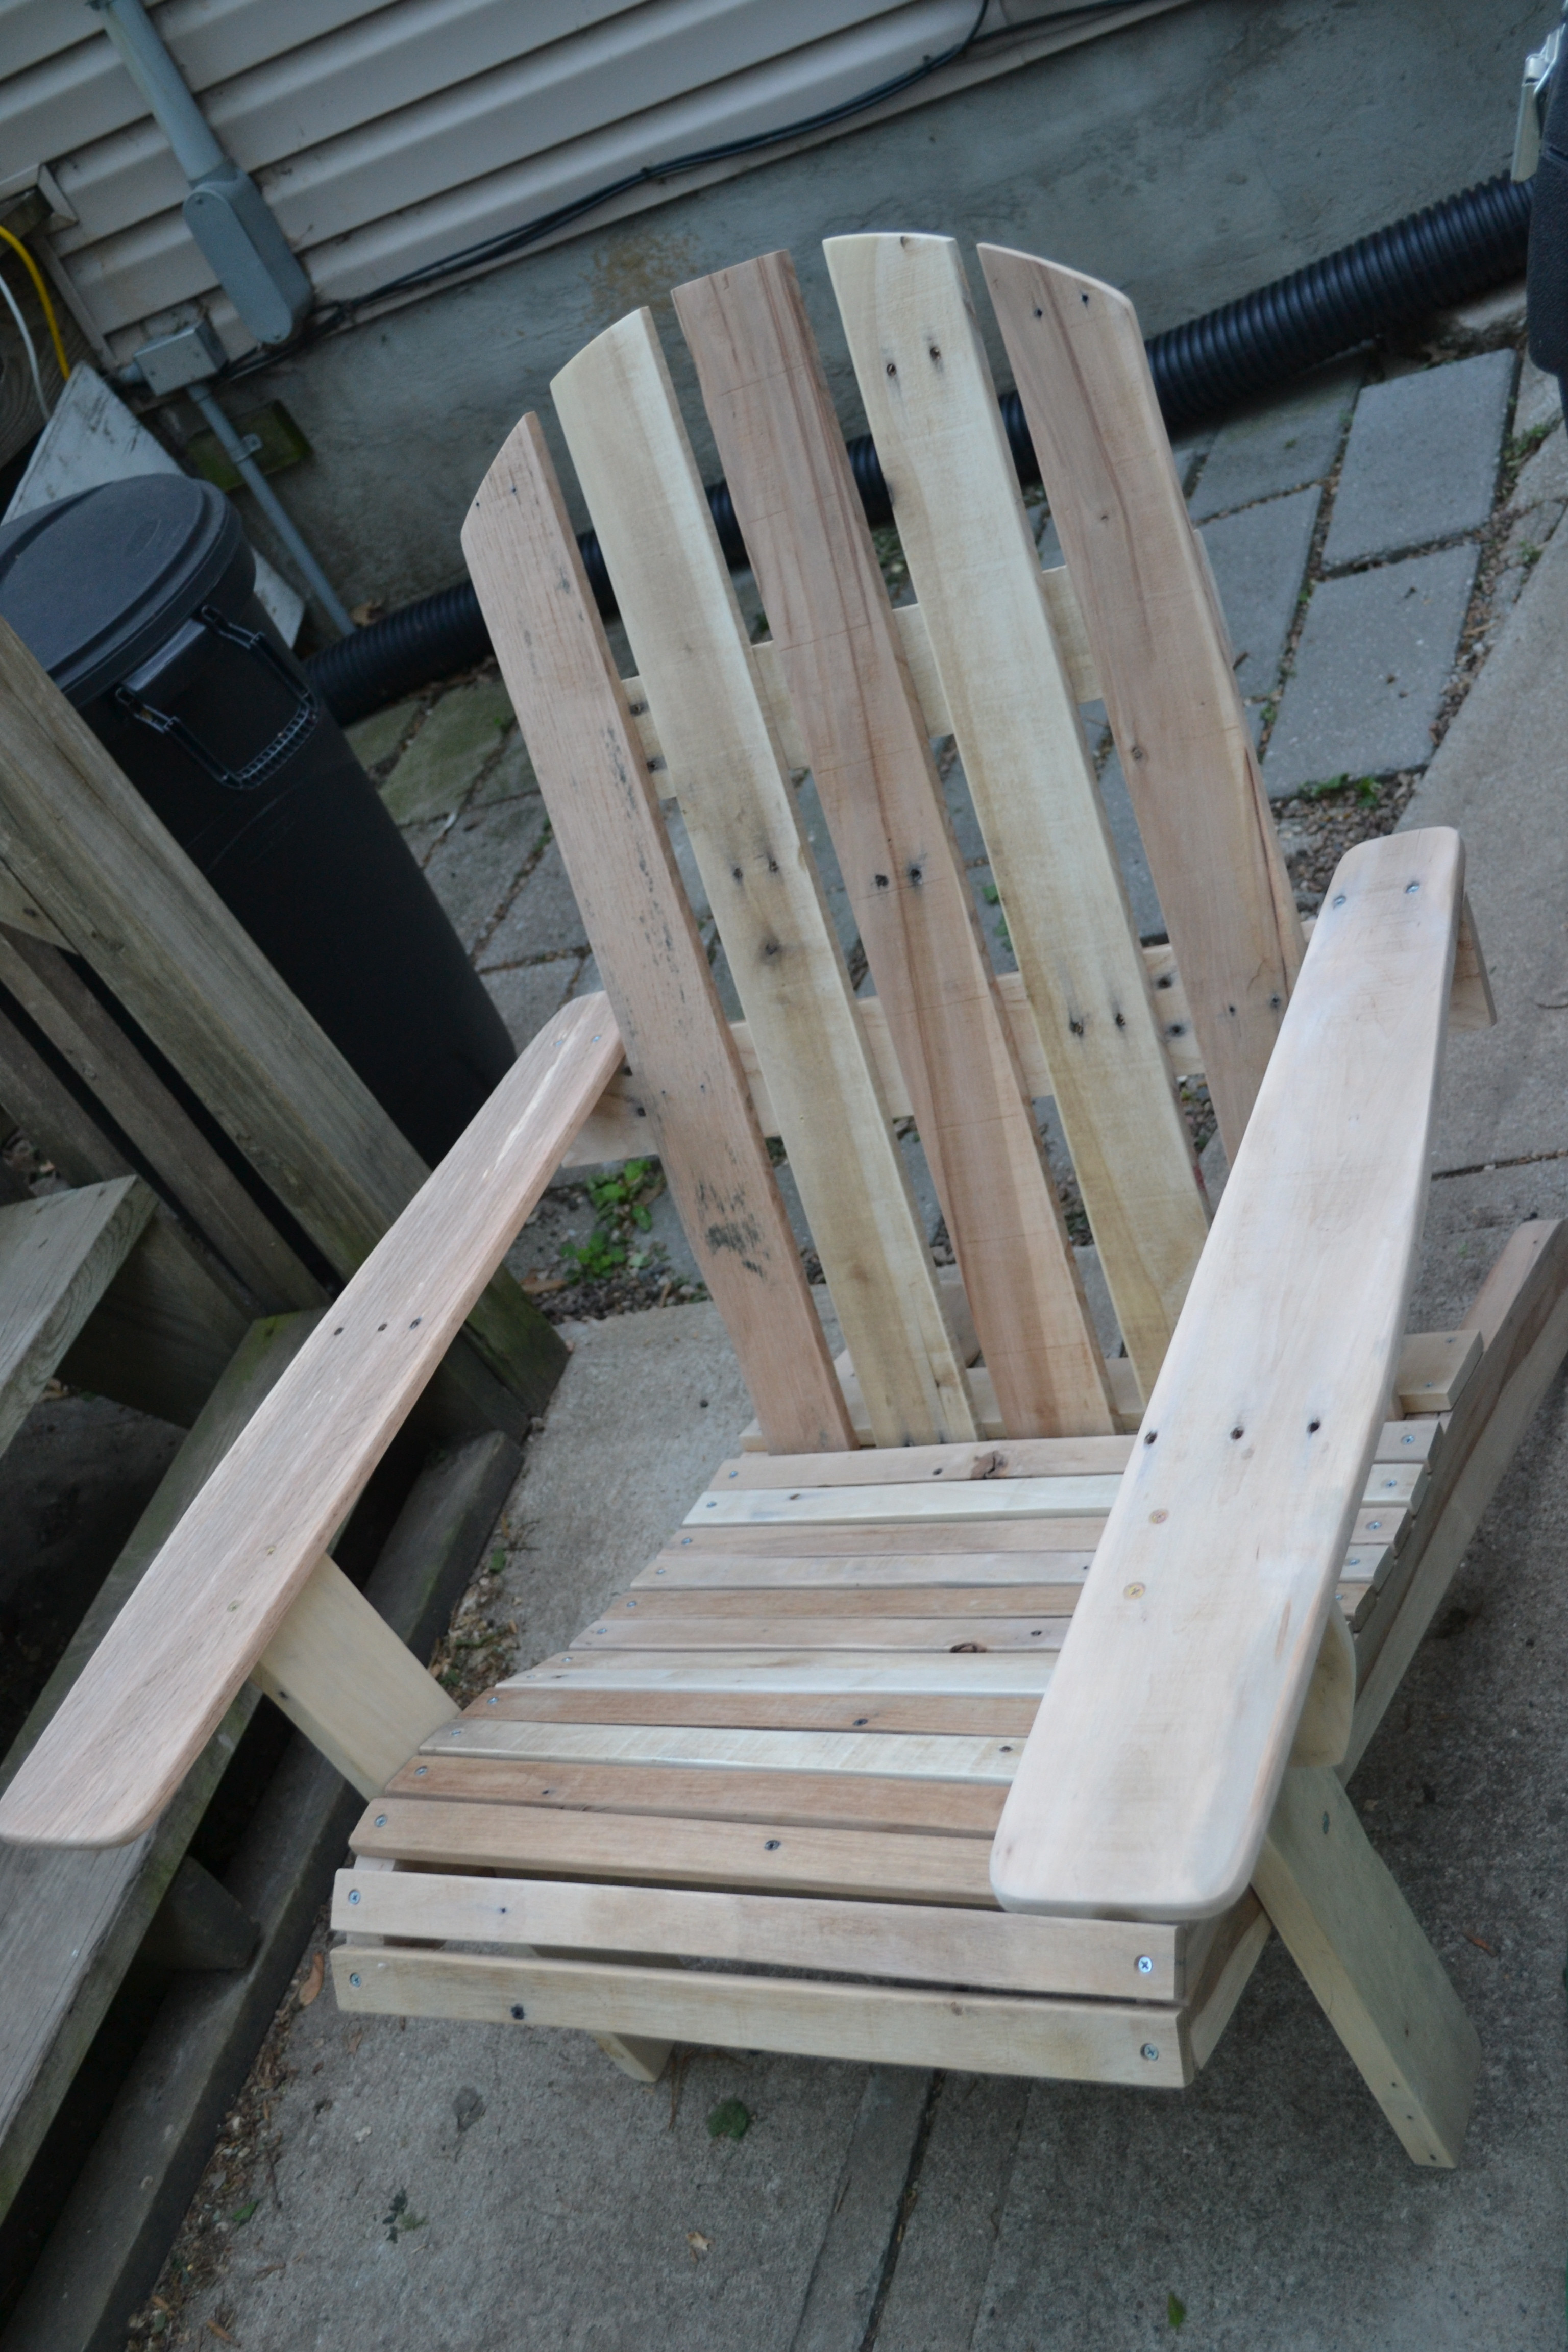 DIY Adirondack Chairs Plans  Diy Pallet Adirondack Chair Plans Wooden PDF birdhouse